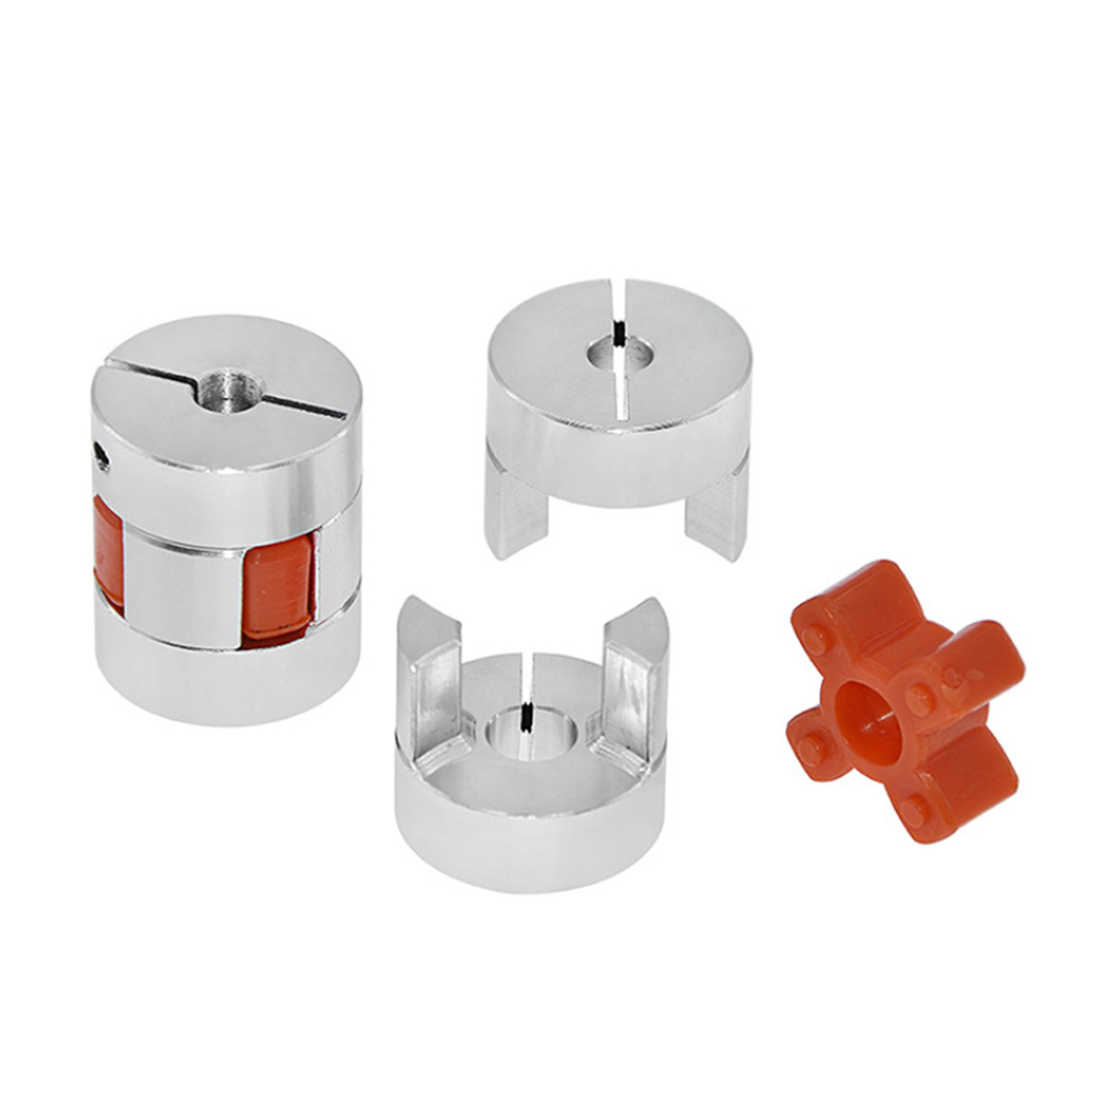 3D Printer Upgrade Leadtime Coupler untuk CR10/CR10S/Ender 2/Ender3/Tornado/Anet A8 Fleksibel poros Skrup